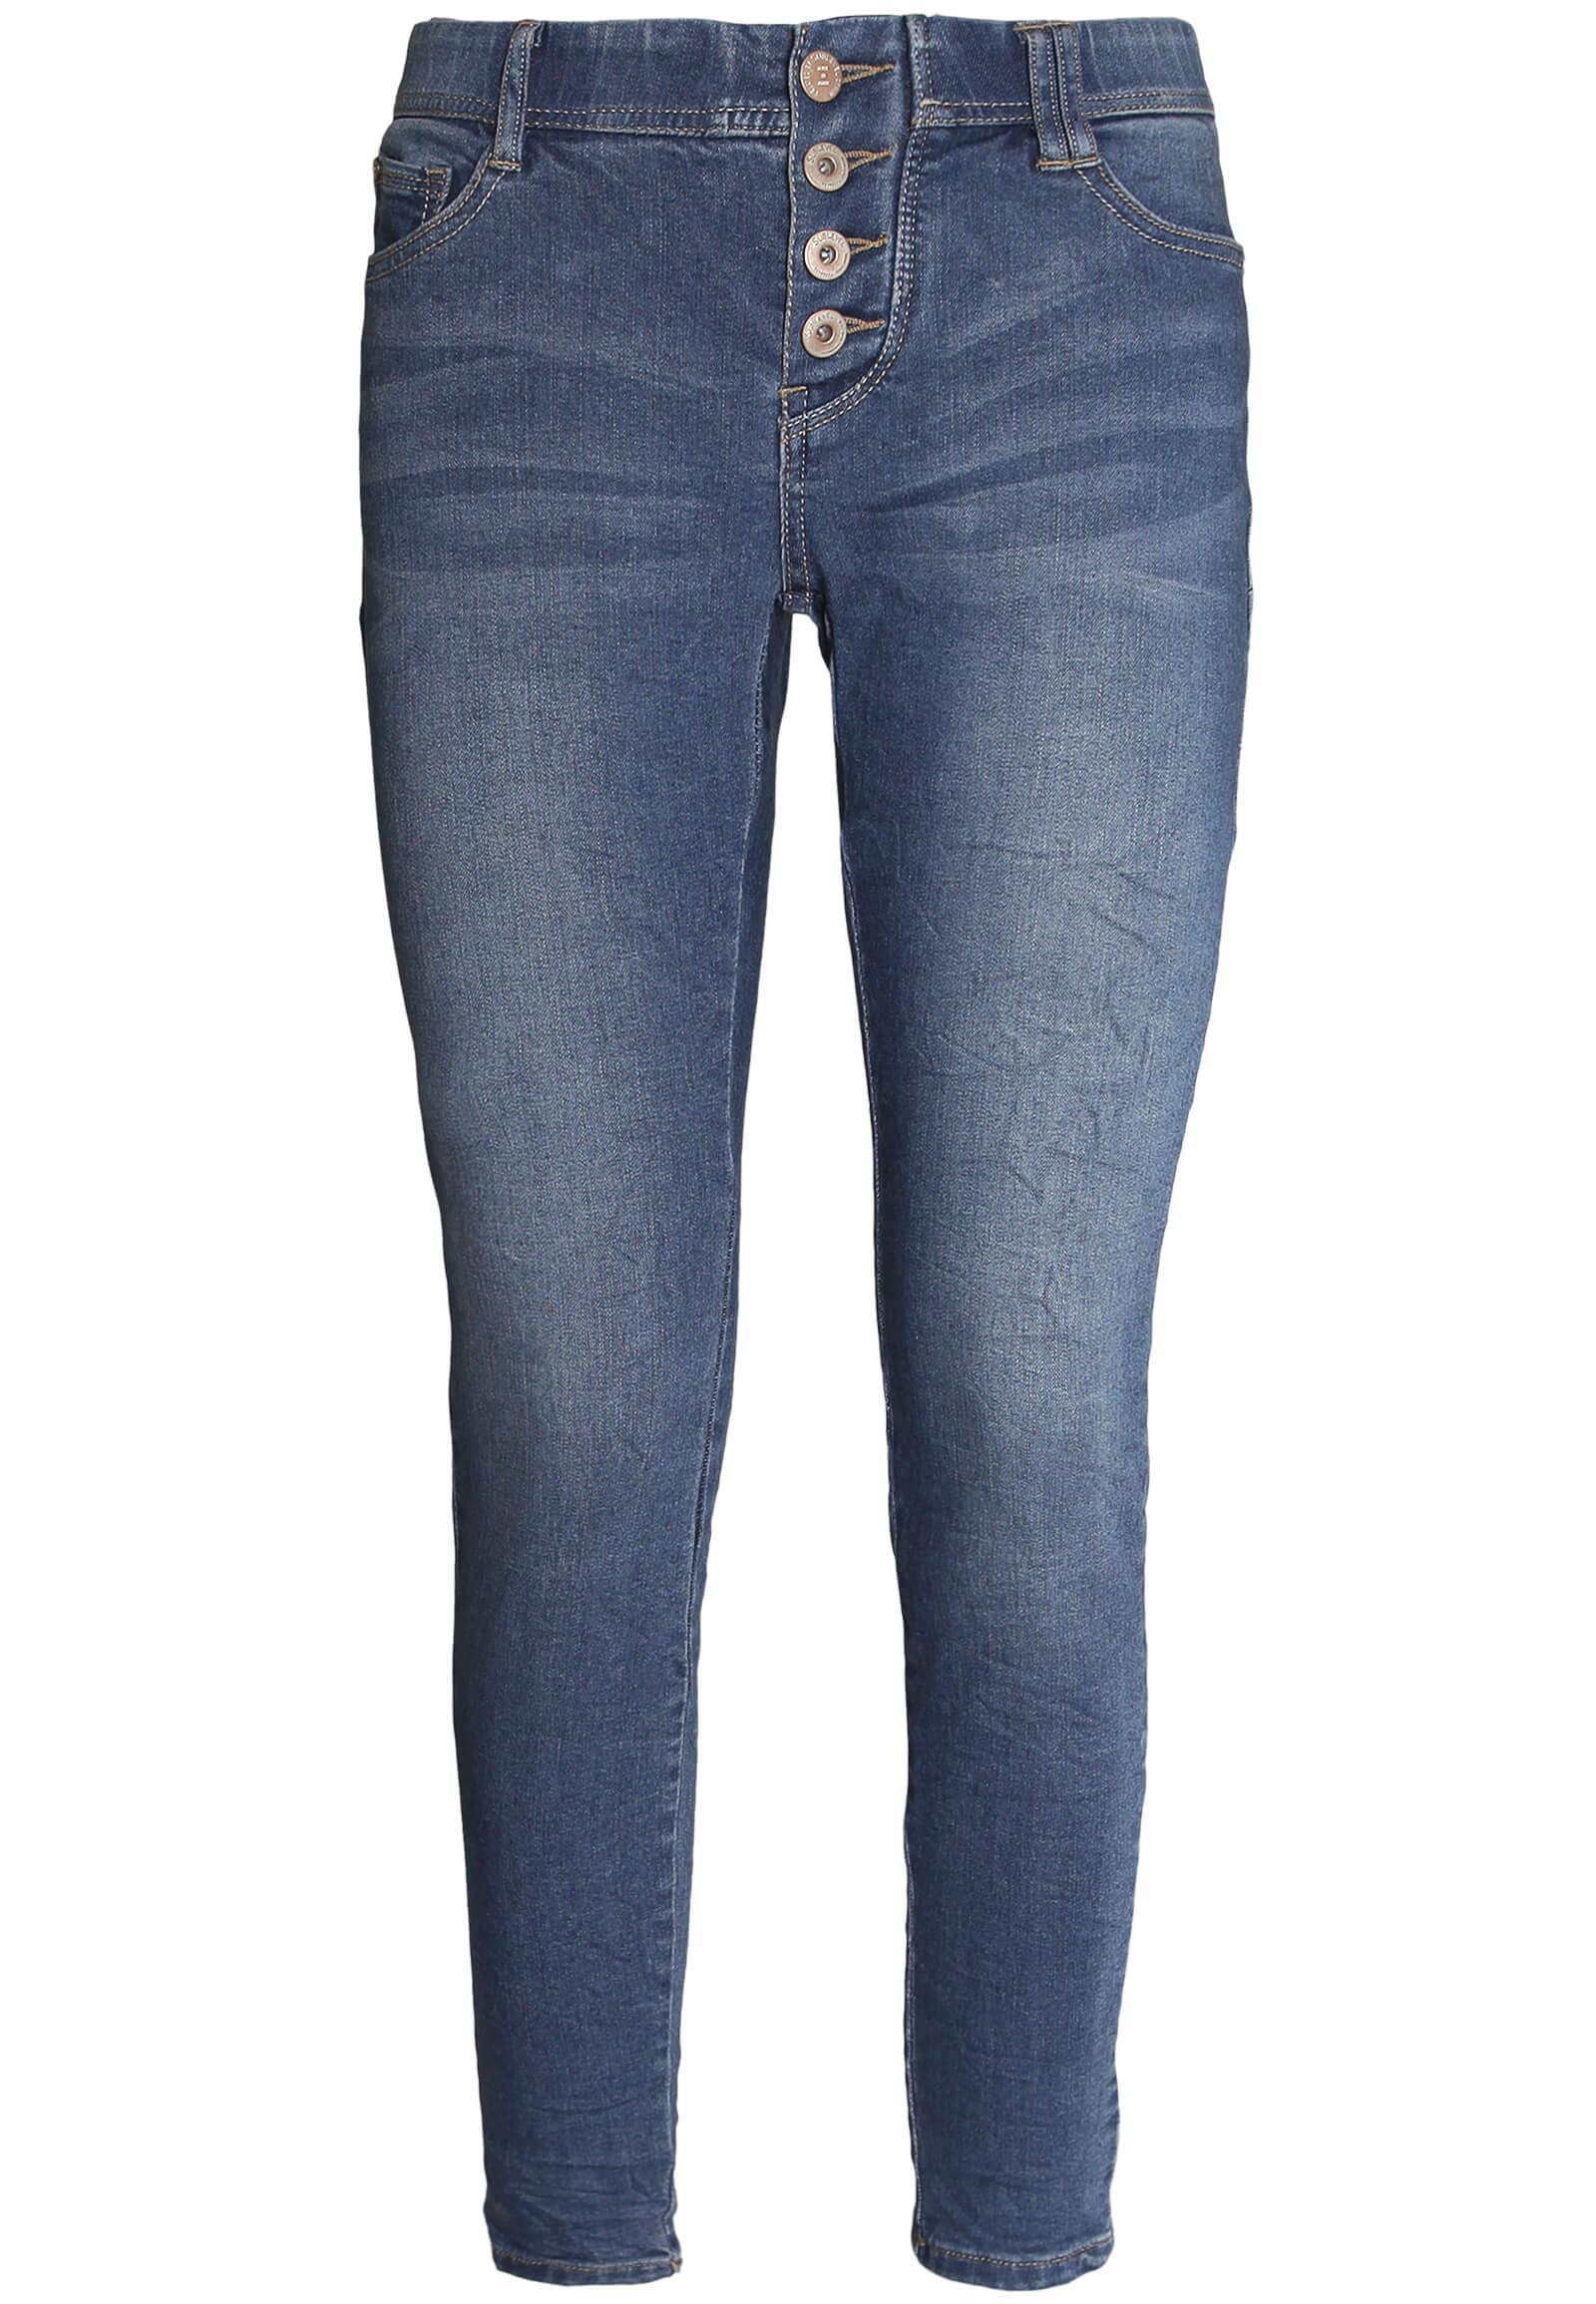 Jeans mit Push up Effekt